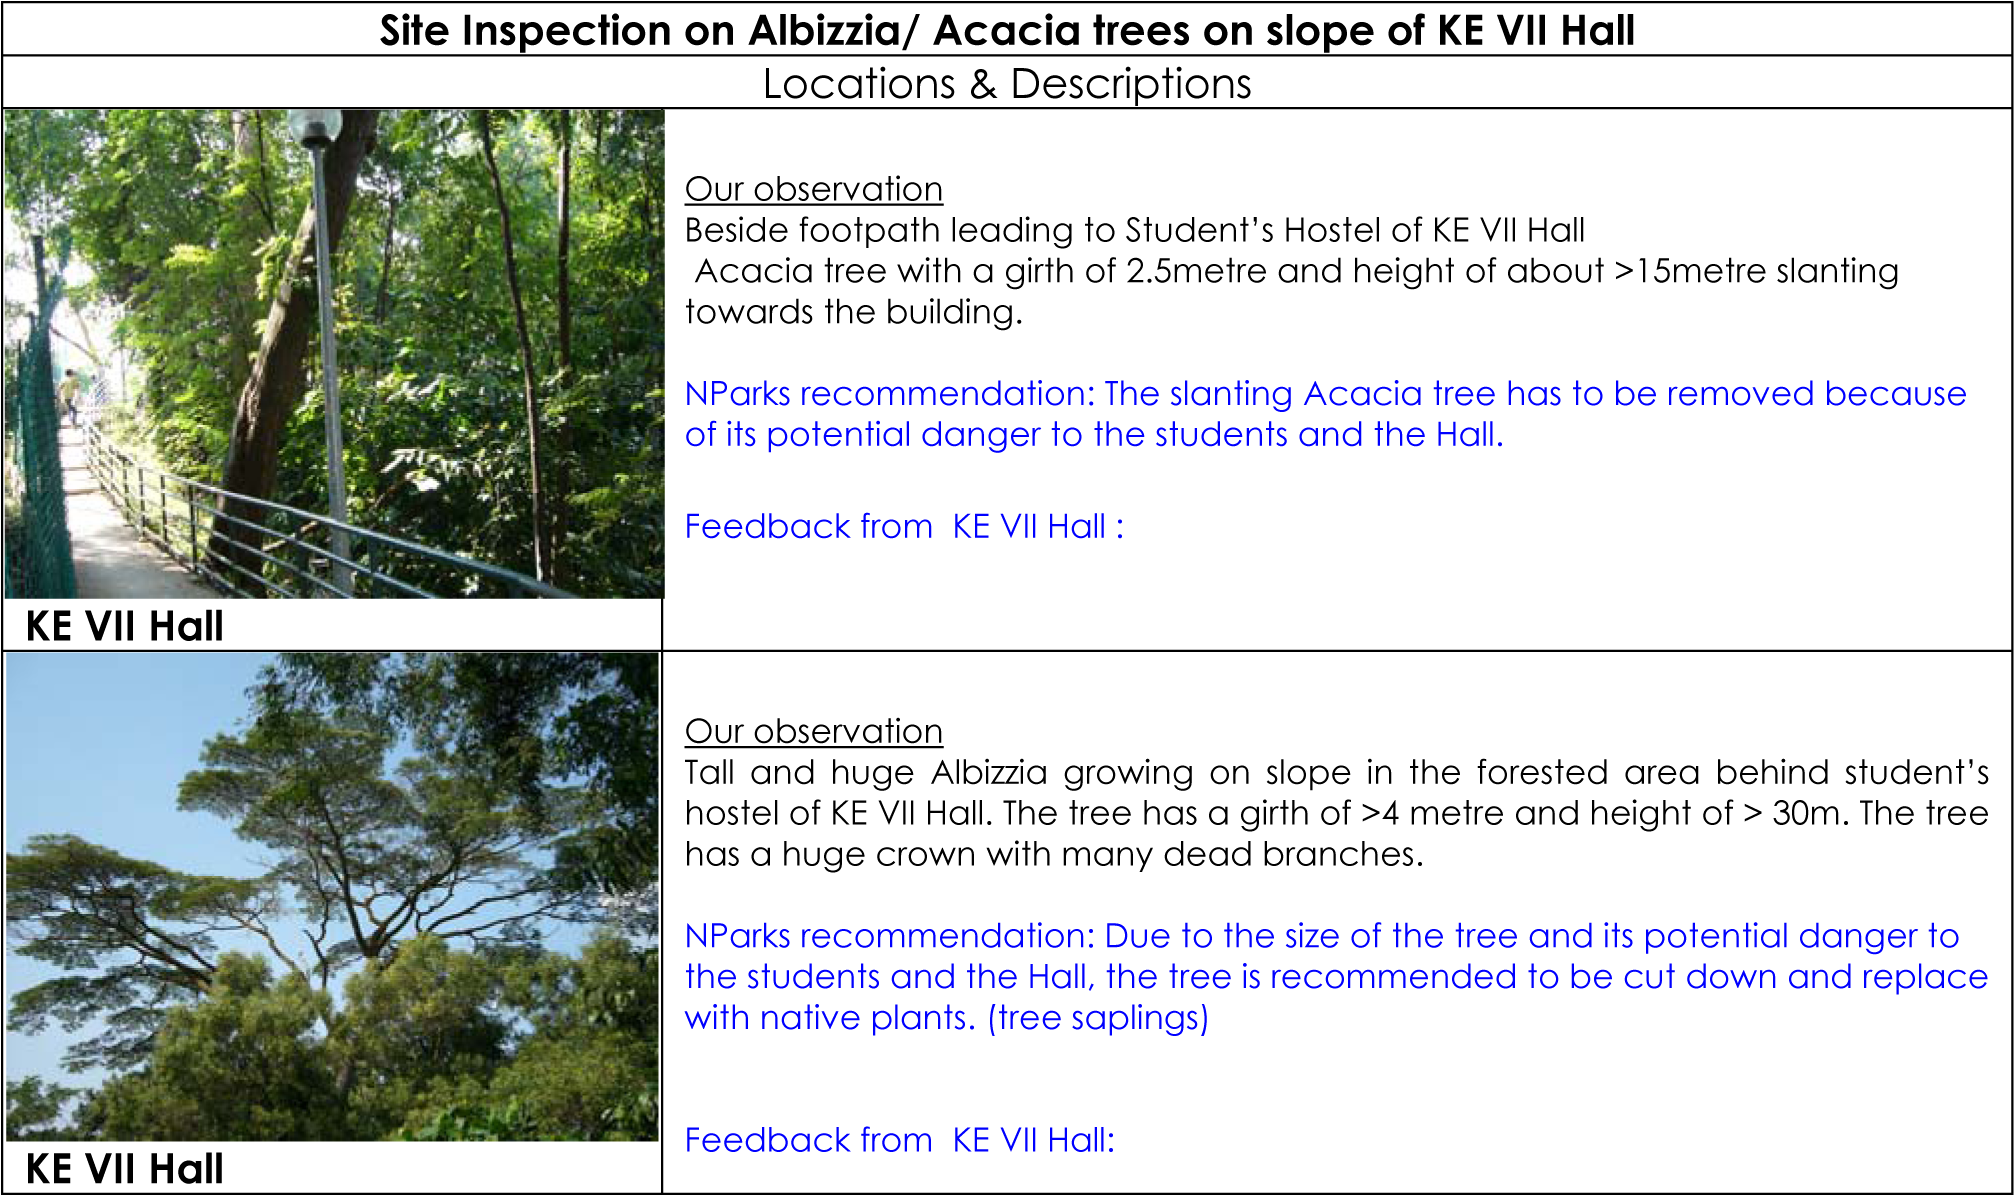 Albizzia Tree Acacia Tree At Ke Vii Hall - Acasia Tree Botanical Name (2034x1216), Png Download